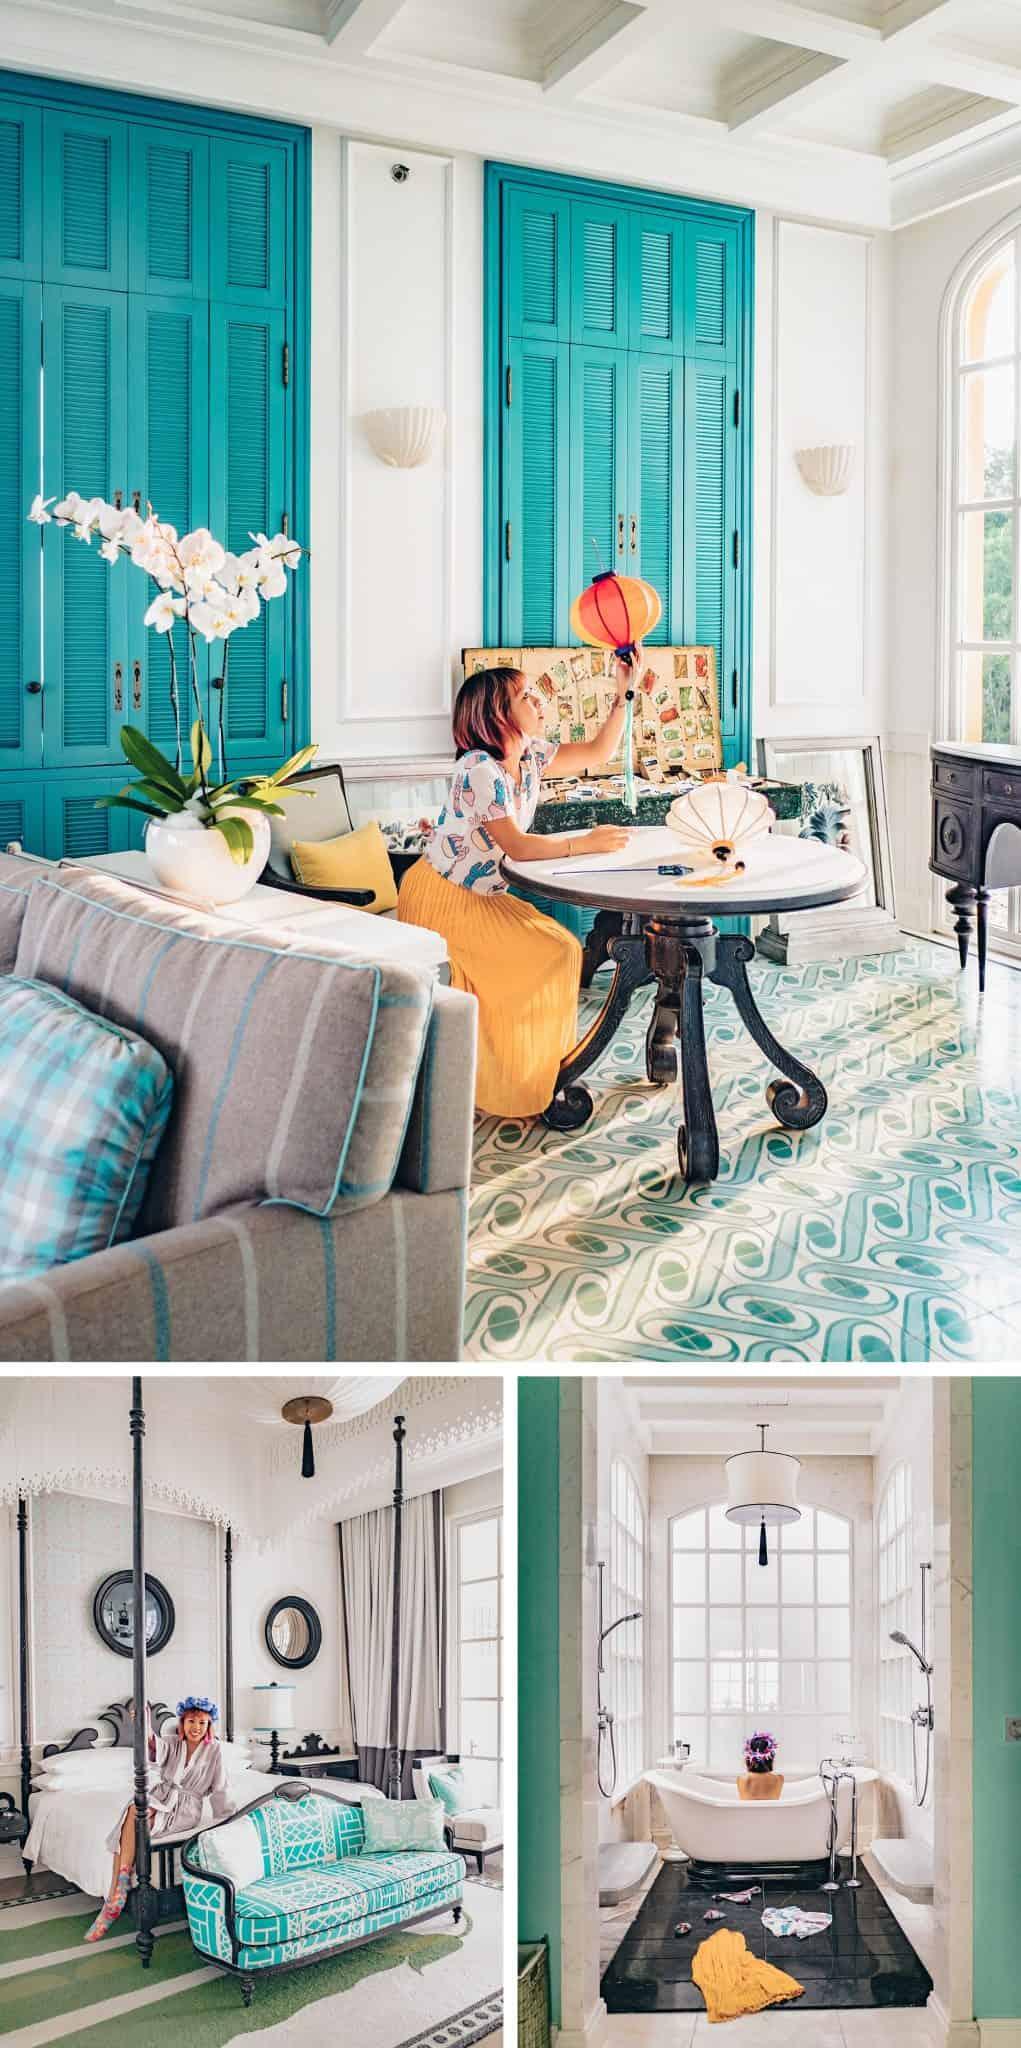 jw marriott turquoise suite